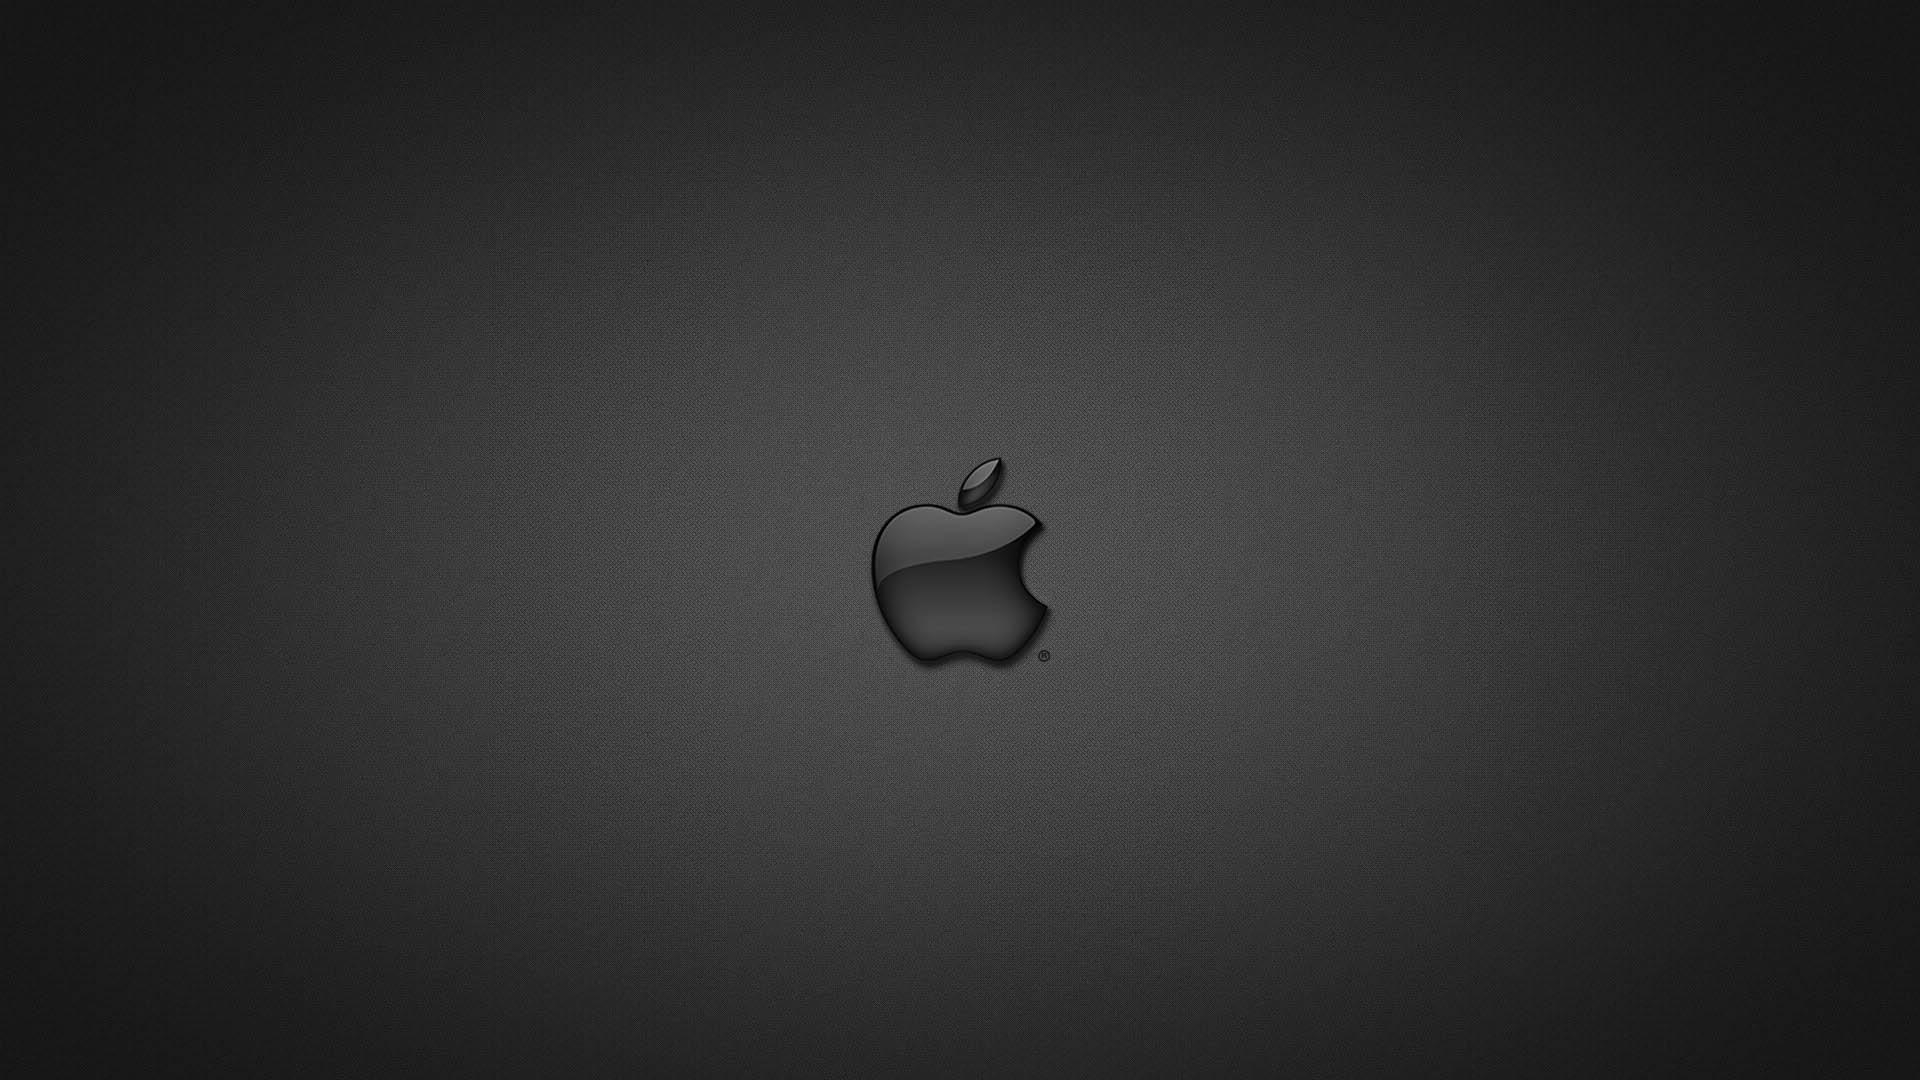 hd s mac wallpaper - photo #32